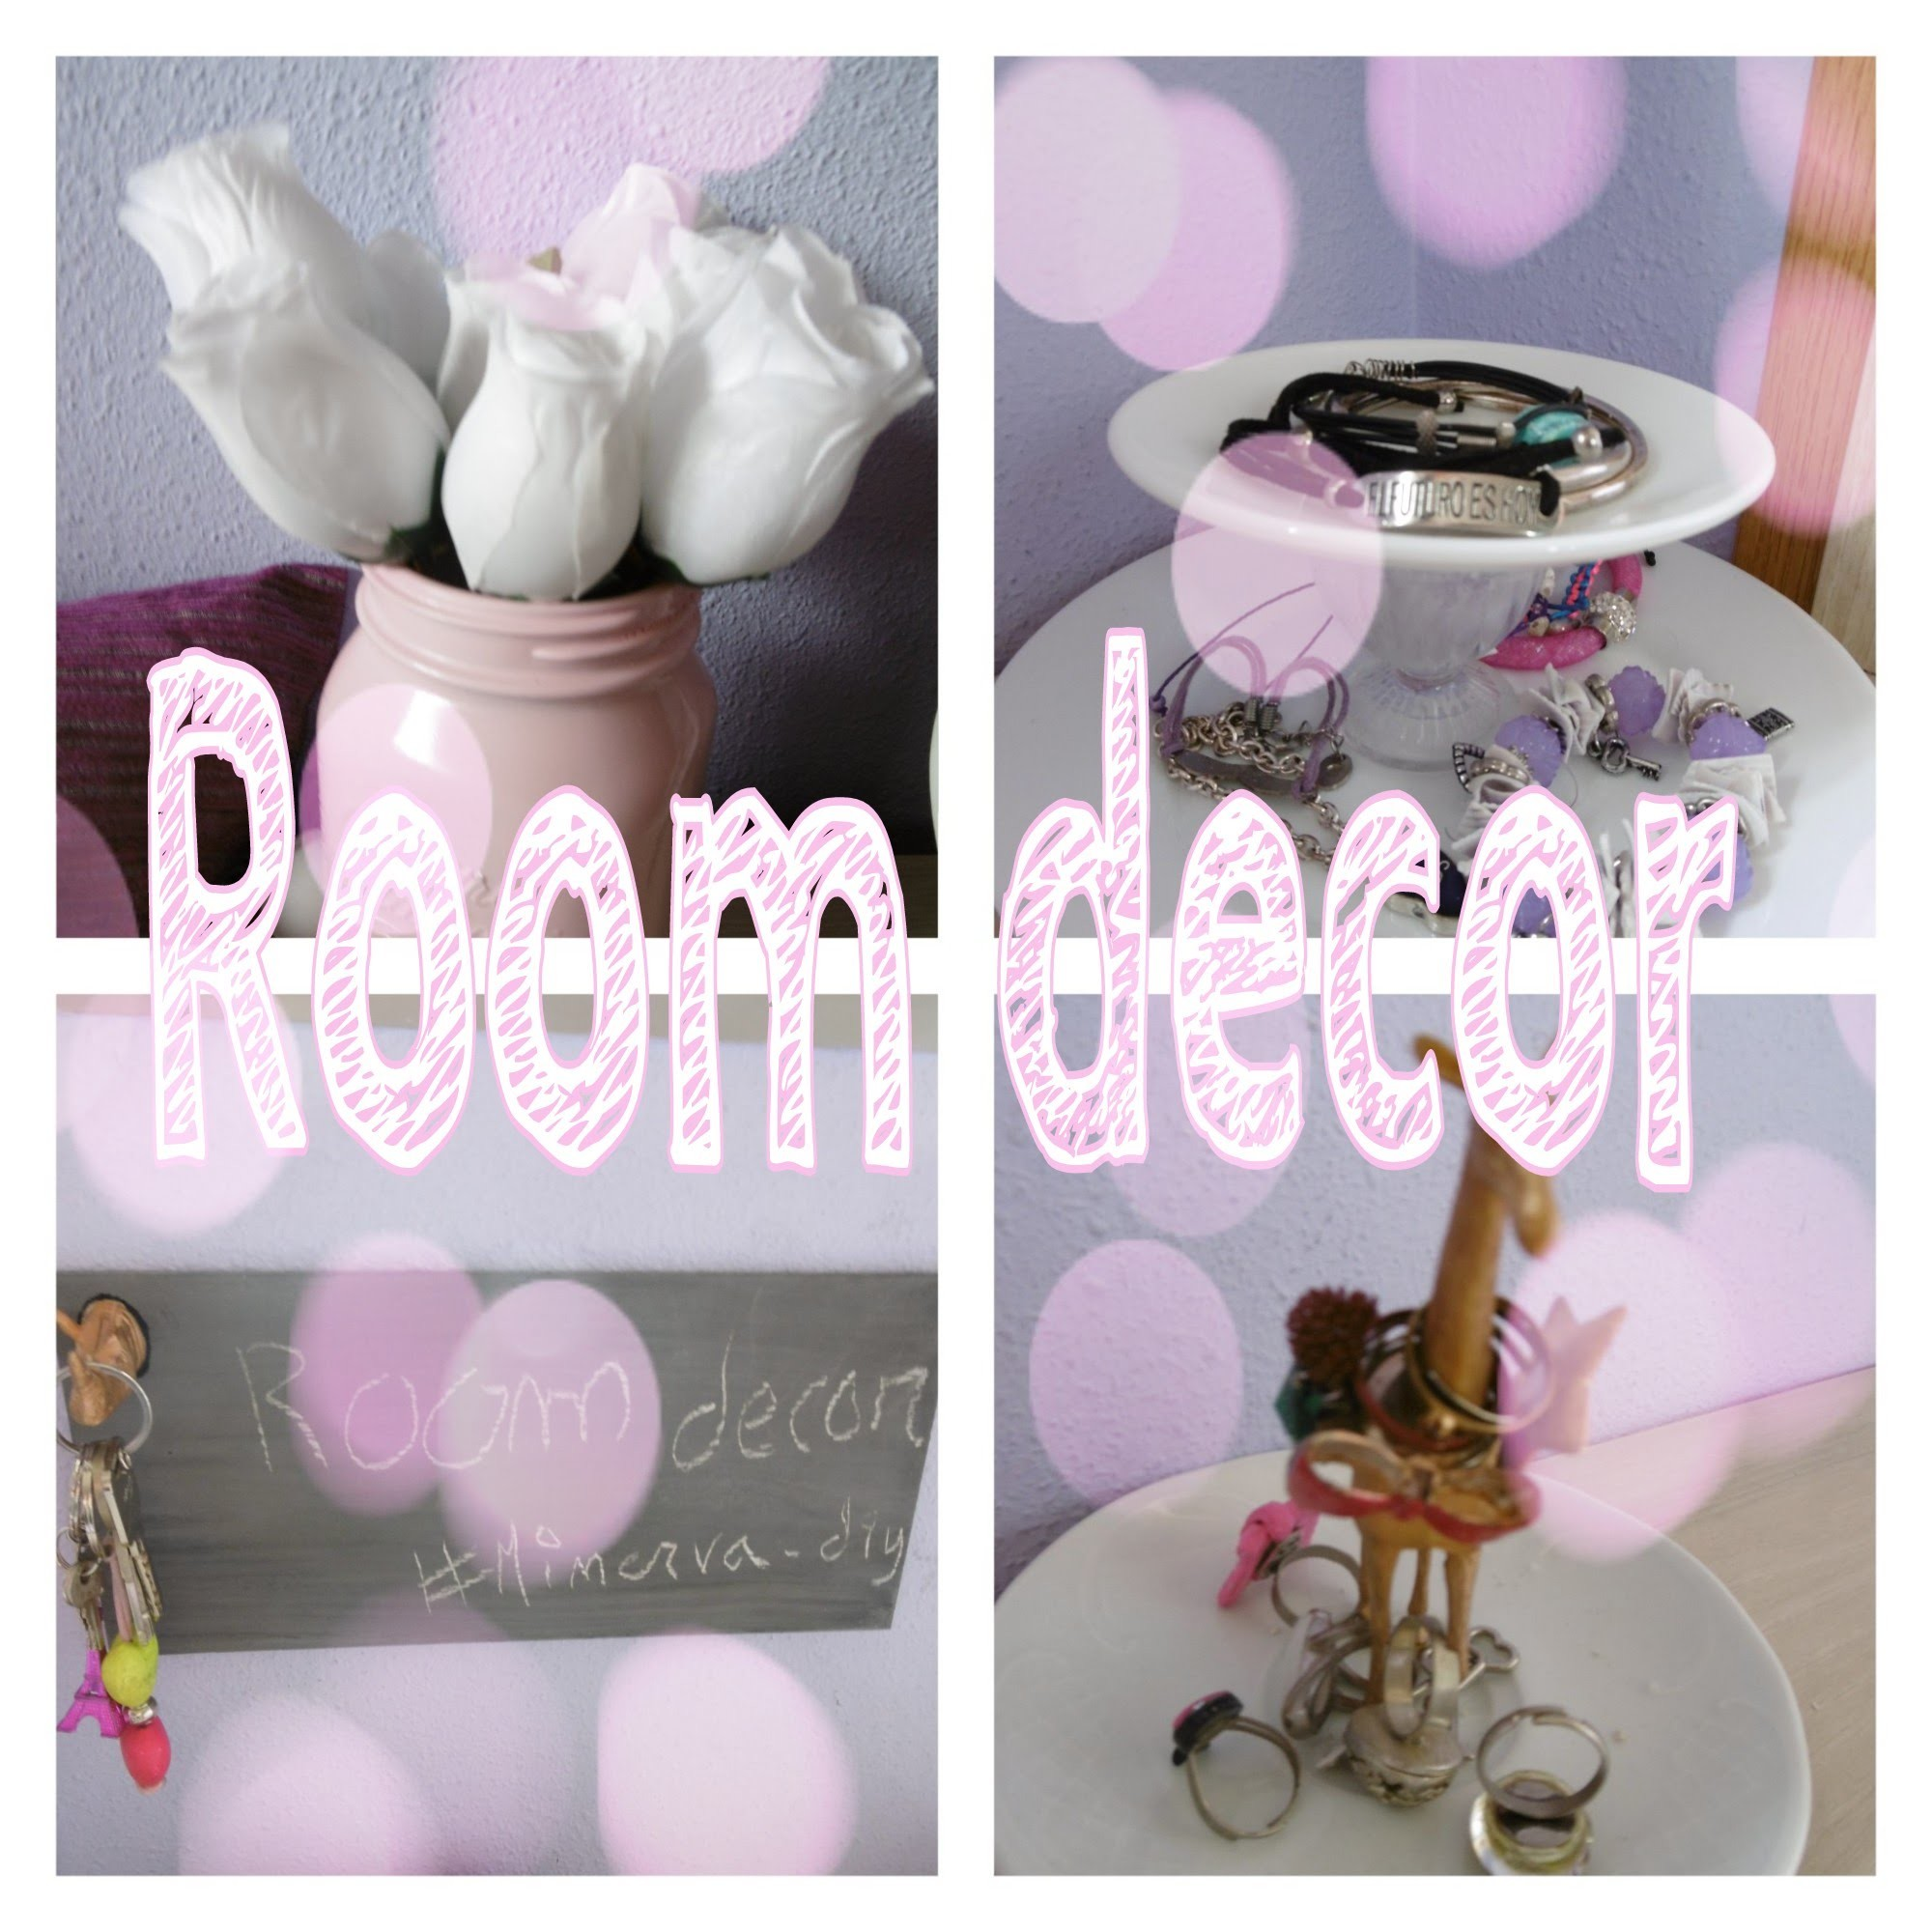 Room decor || Minerva diy